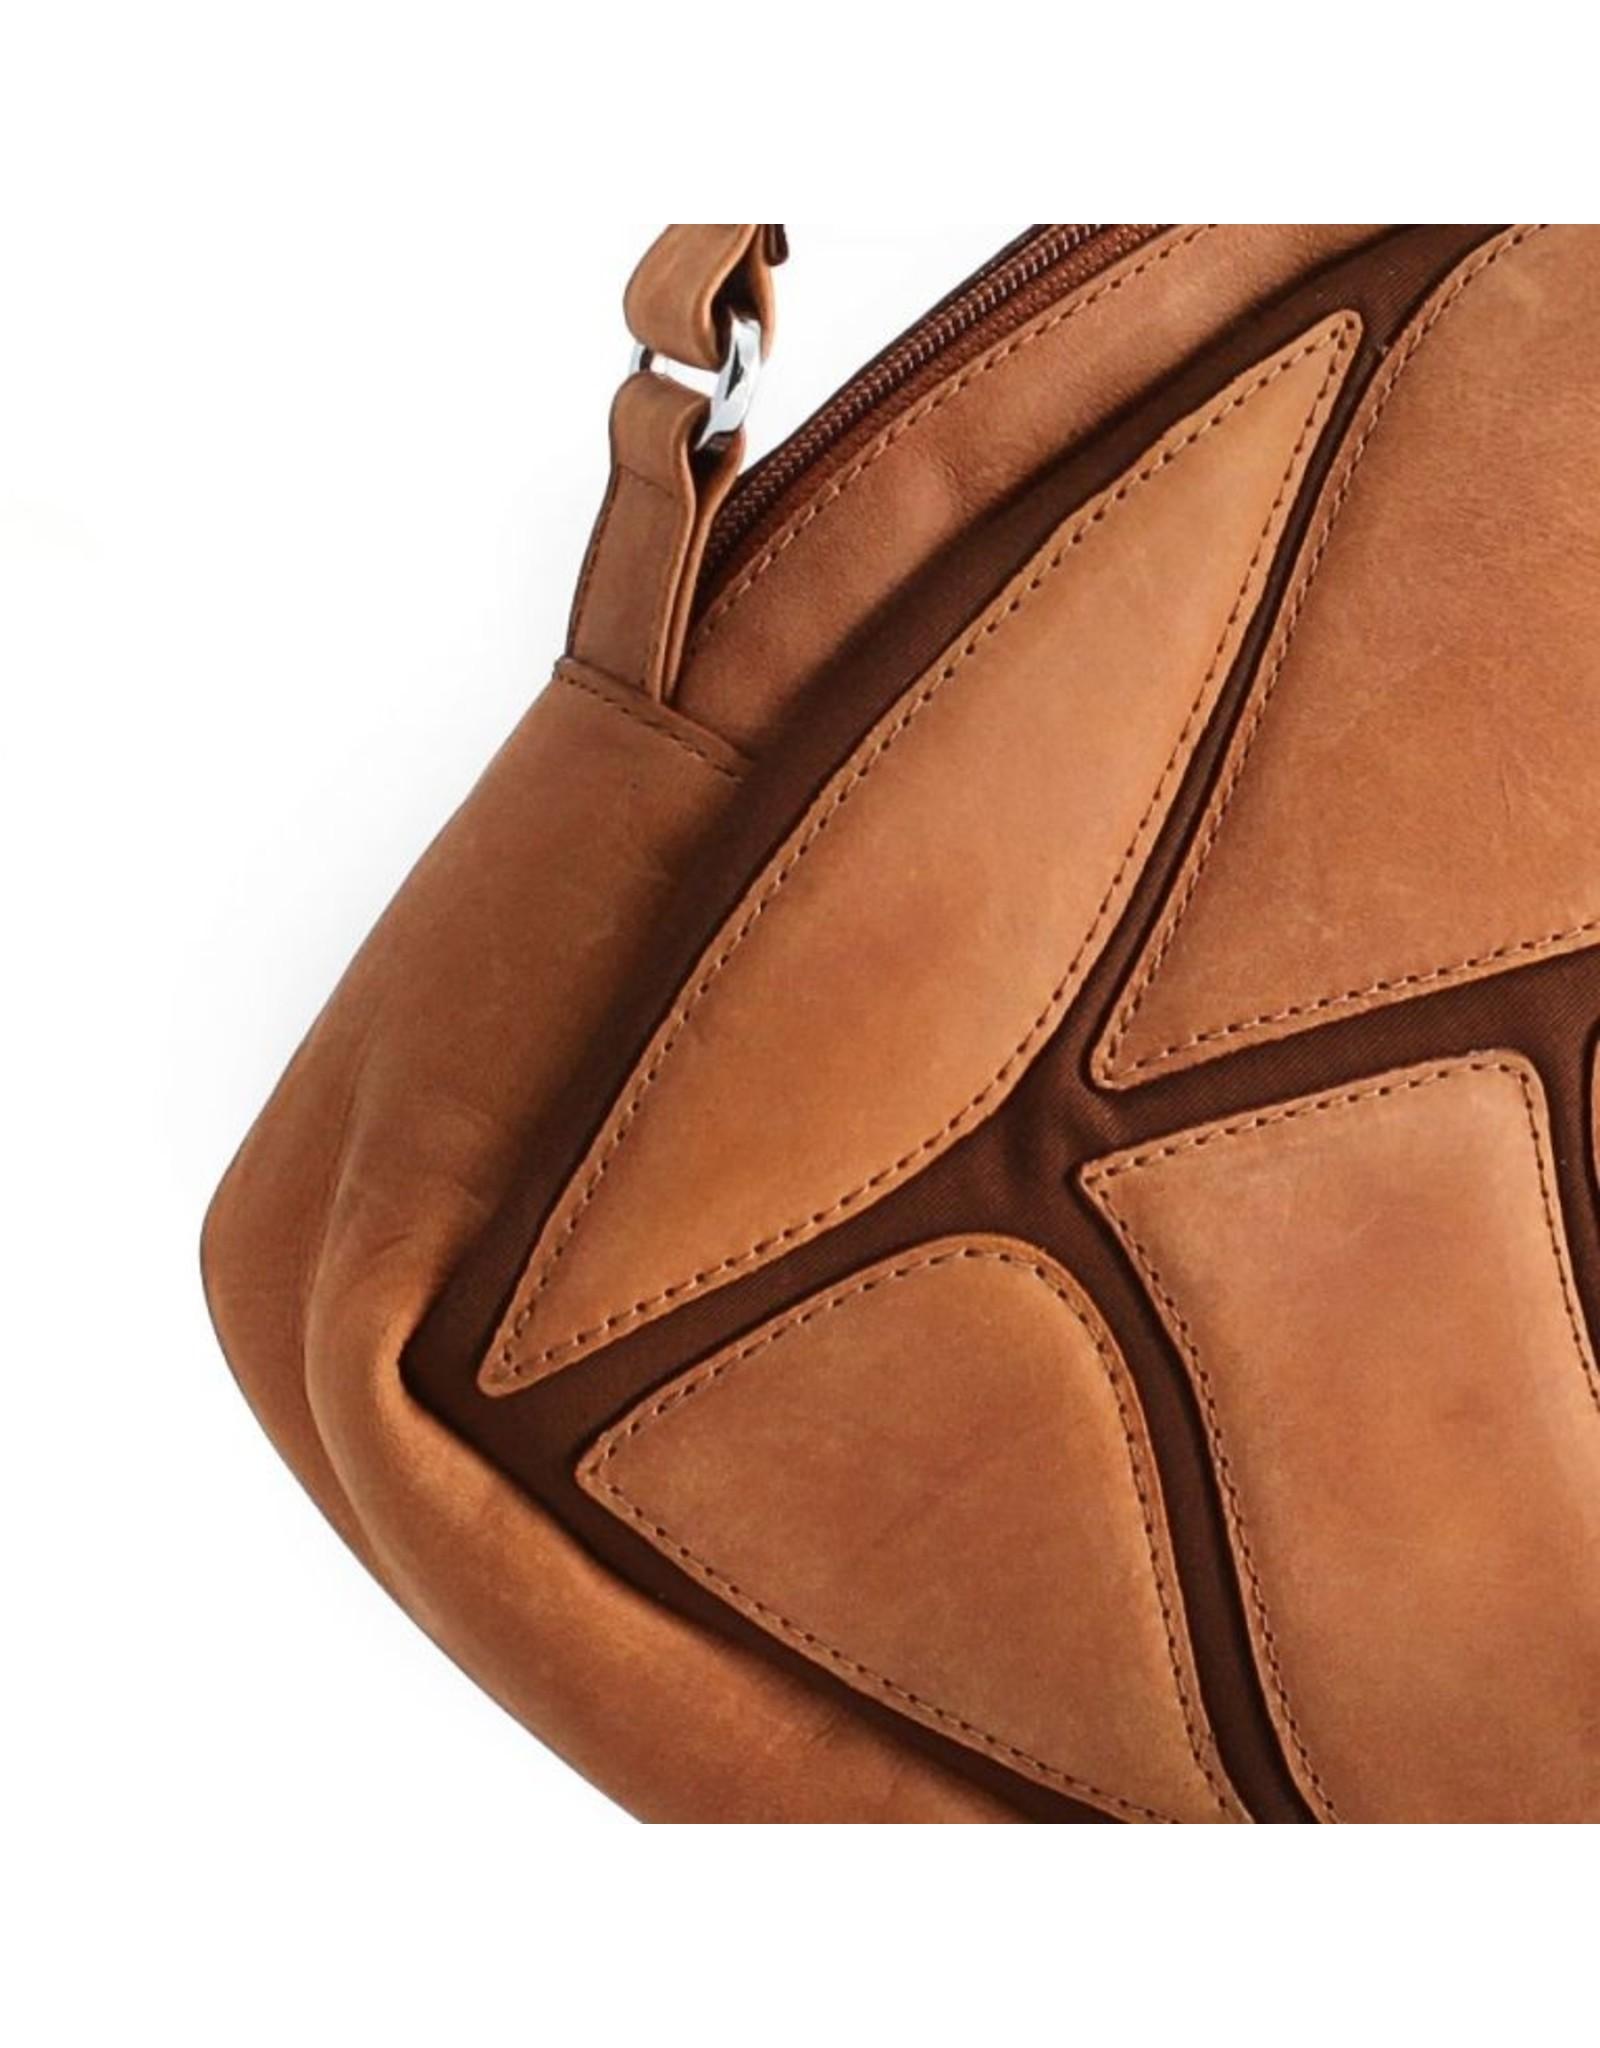 by-Lin Dutch Design Leather bags - by-Lin Dutch Design Daun Leather shoulder bag cognac